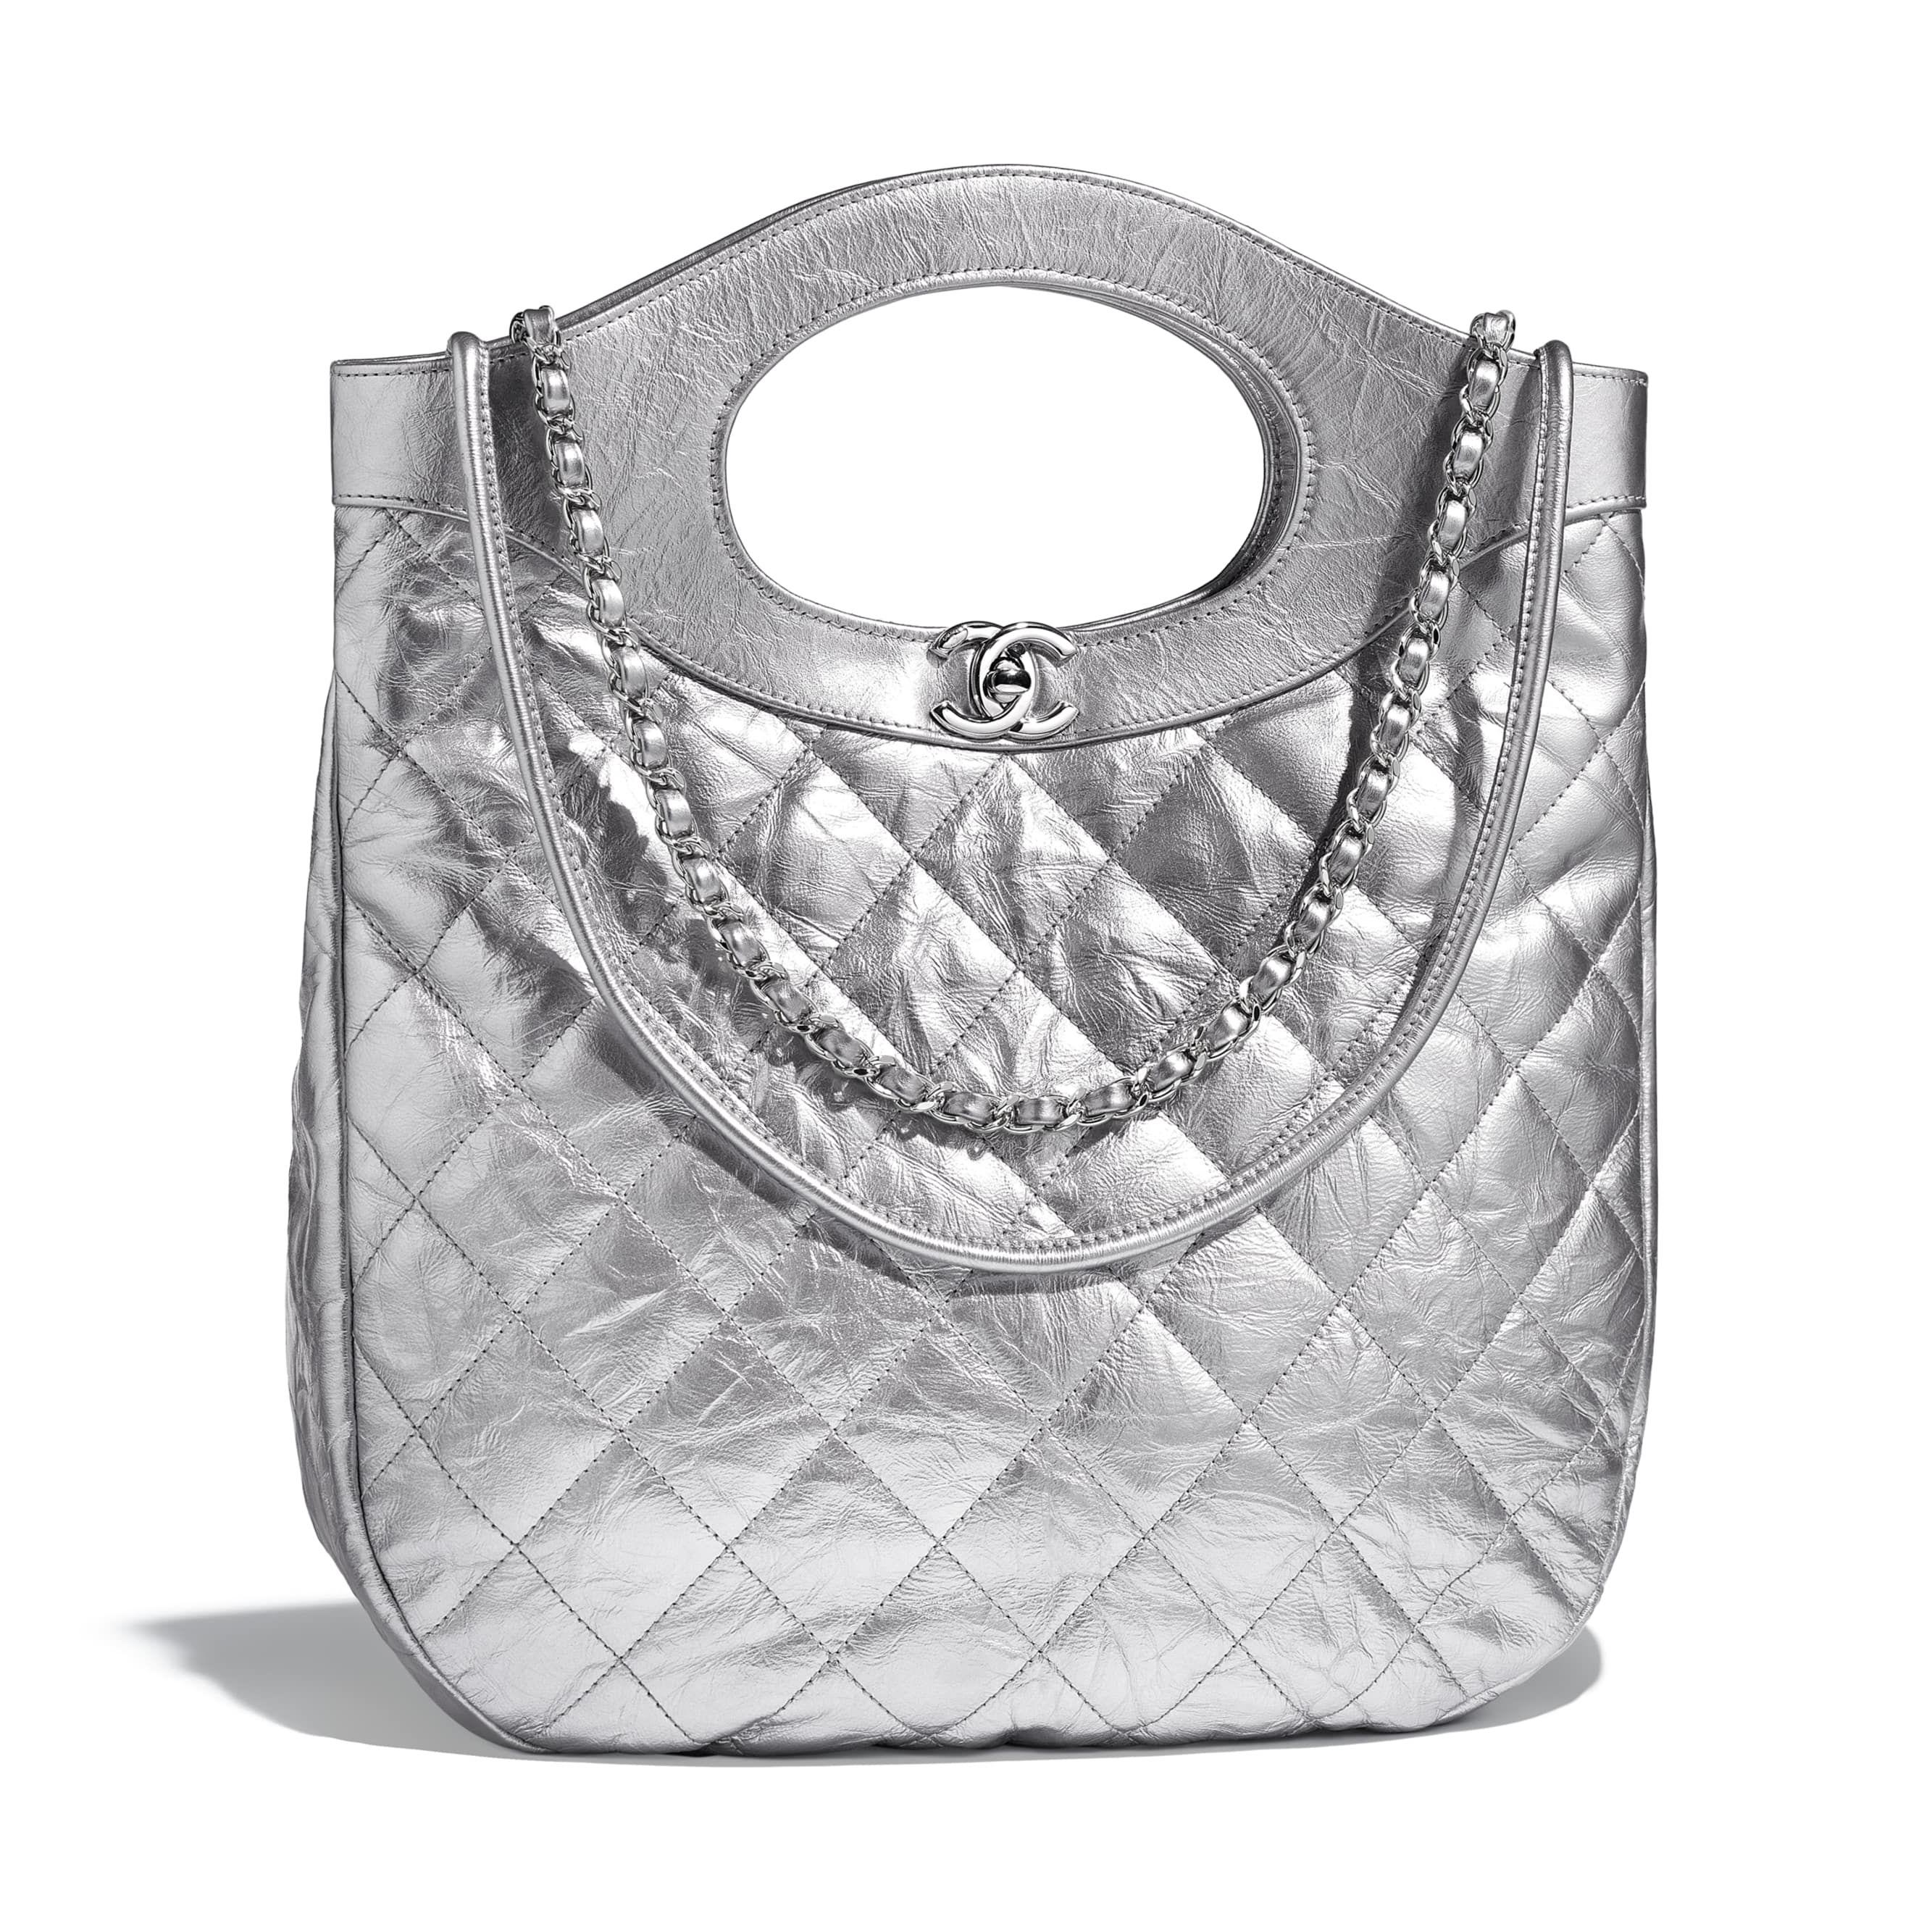 6a66895cbd CHANEL 31 Small Shopping Bag - Silver - Metallic Crumpled Calfskin ...